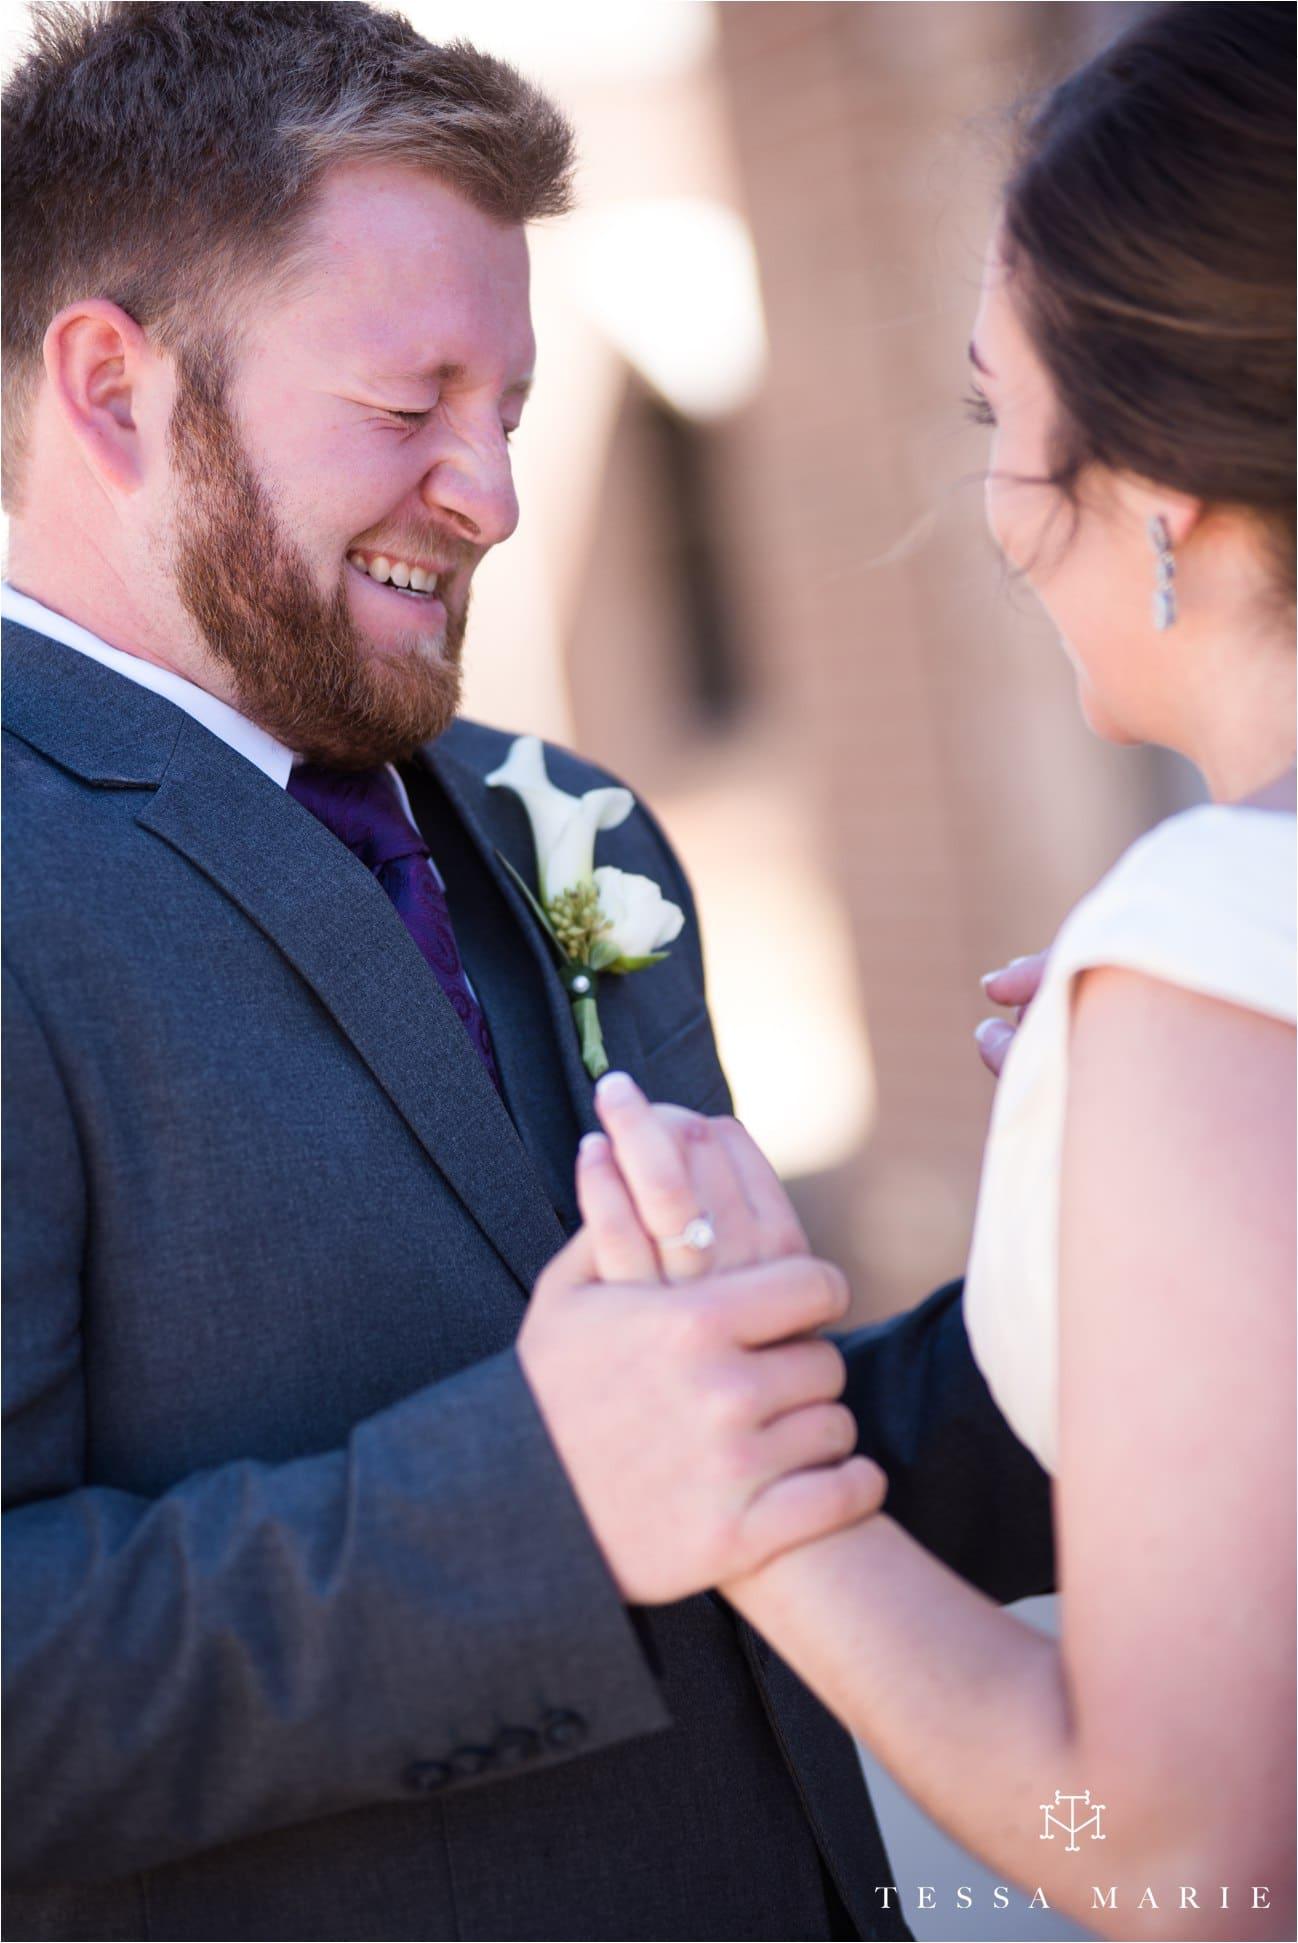 tessa_marie_weddings_wedding_moments_Tessa_marie_studios_0045